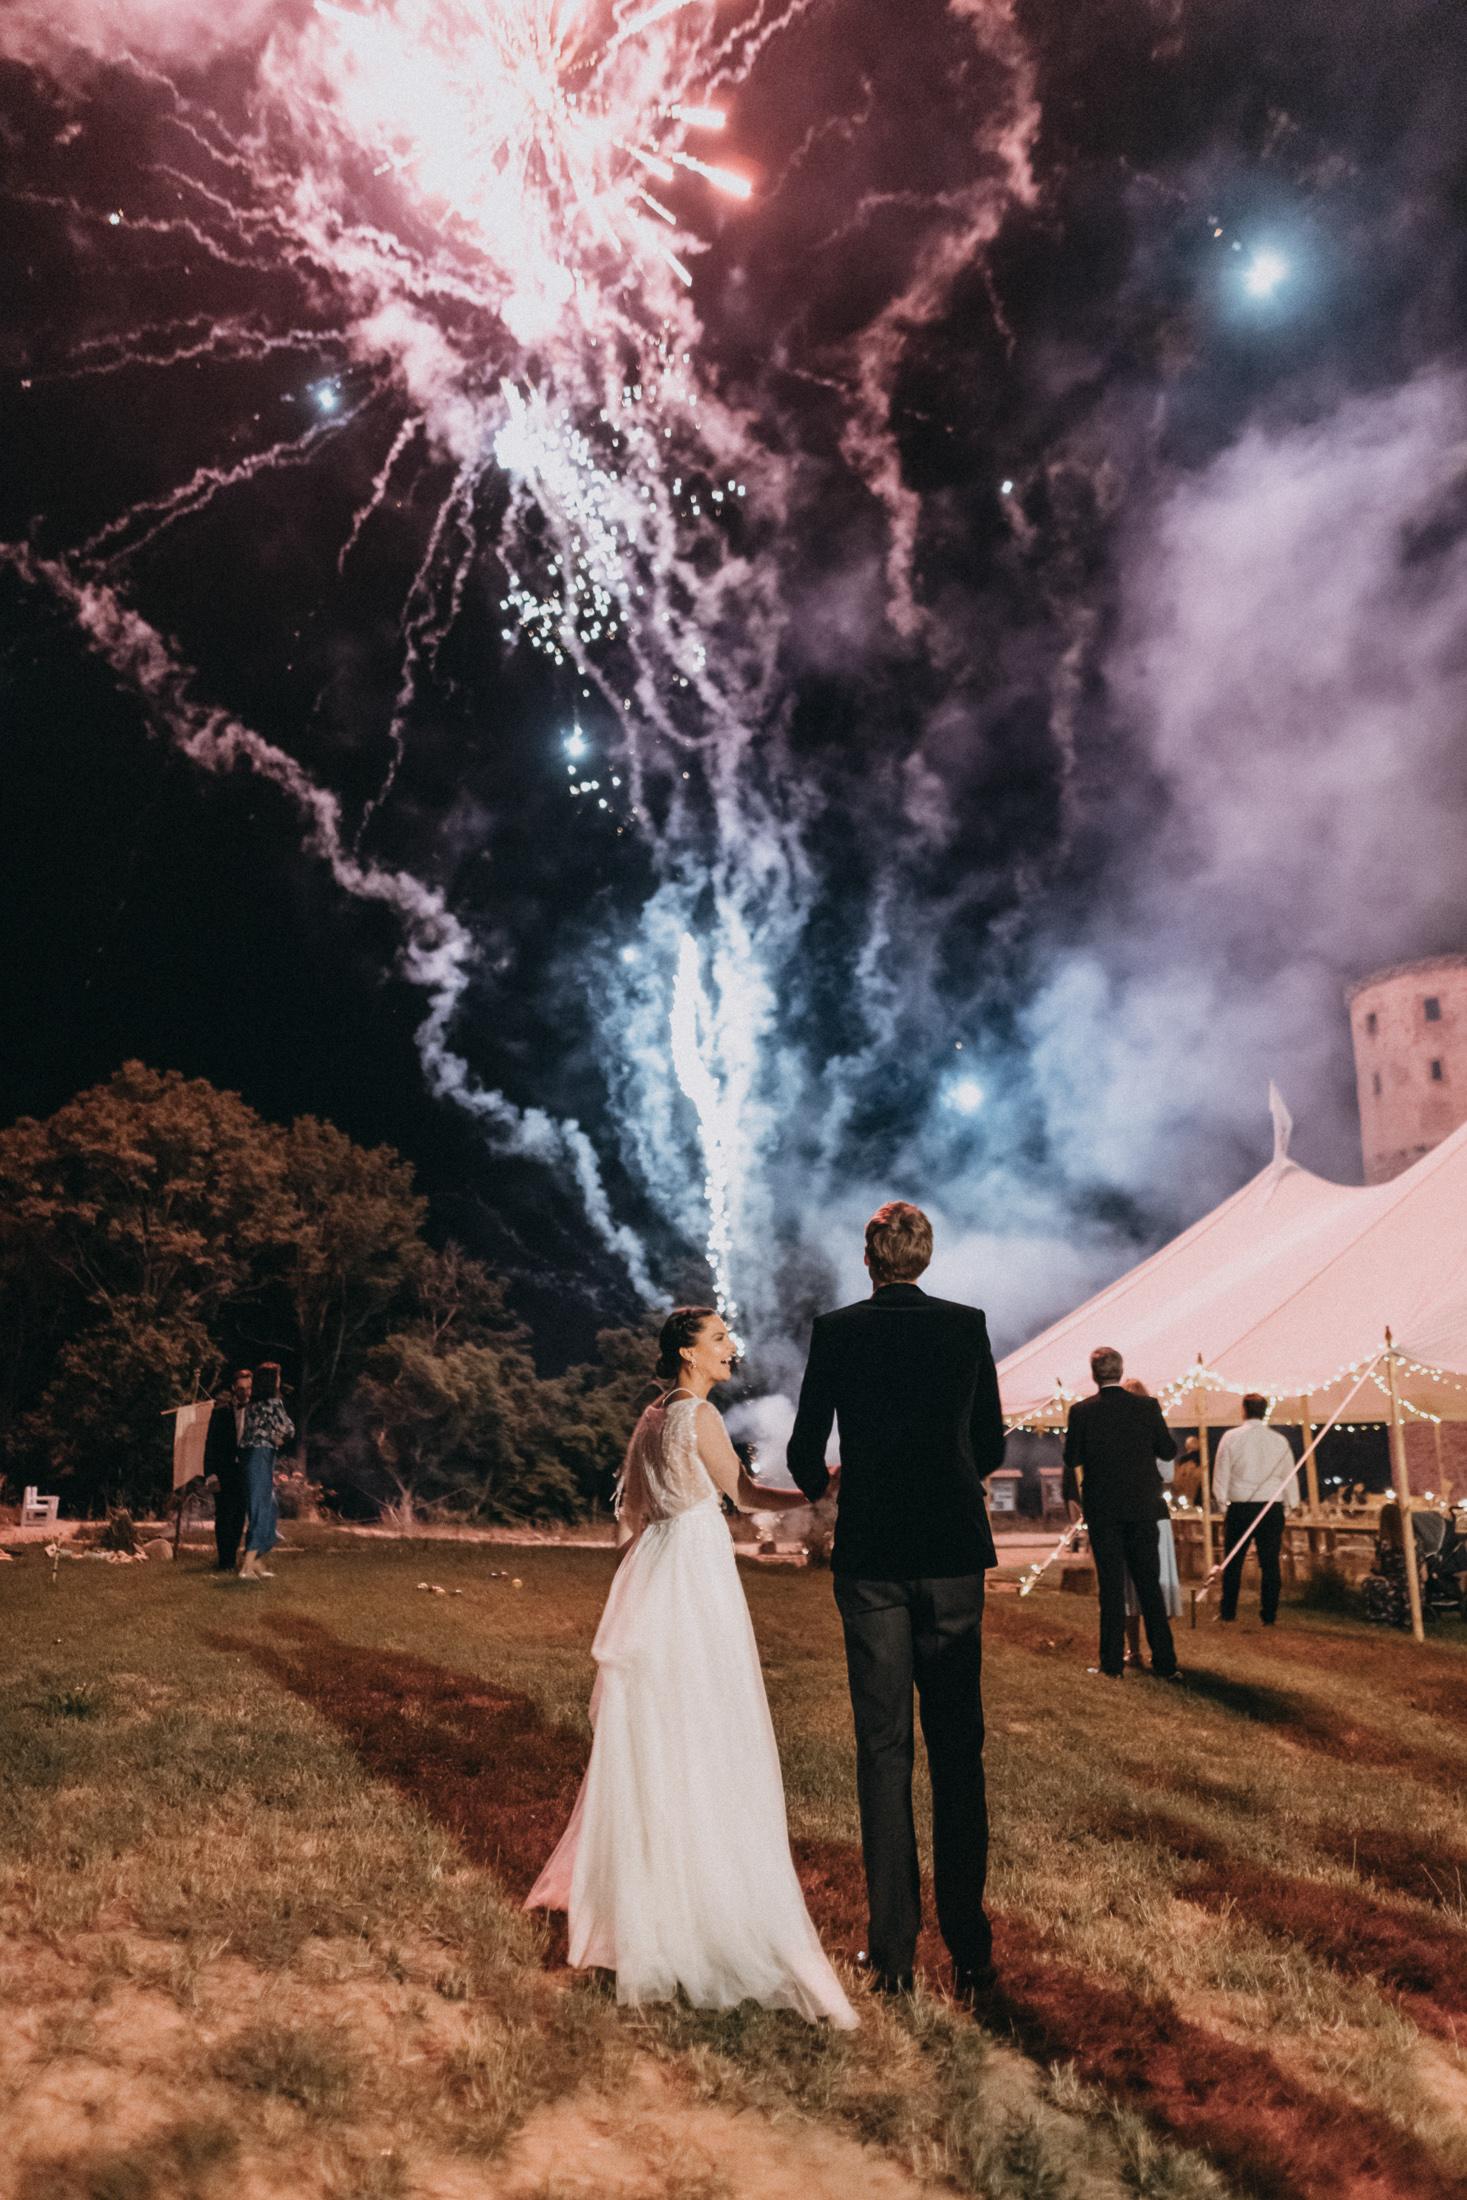 evening castle ruins wedding ceremony firework